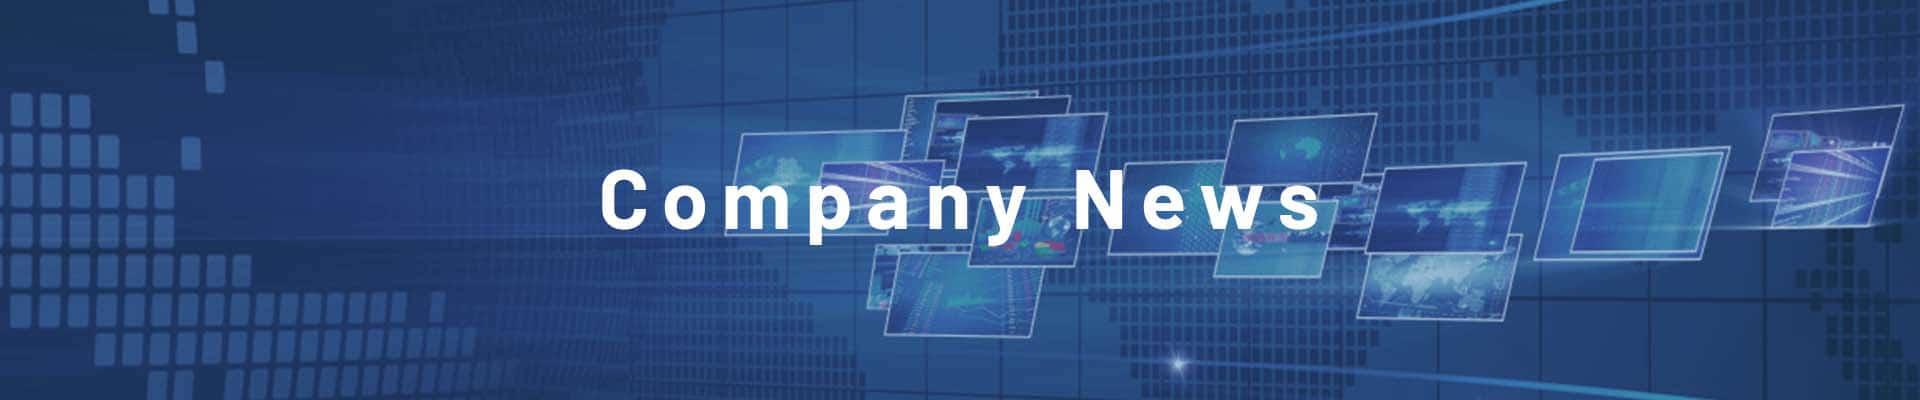 Company News banner